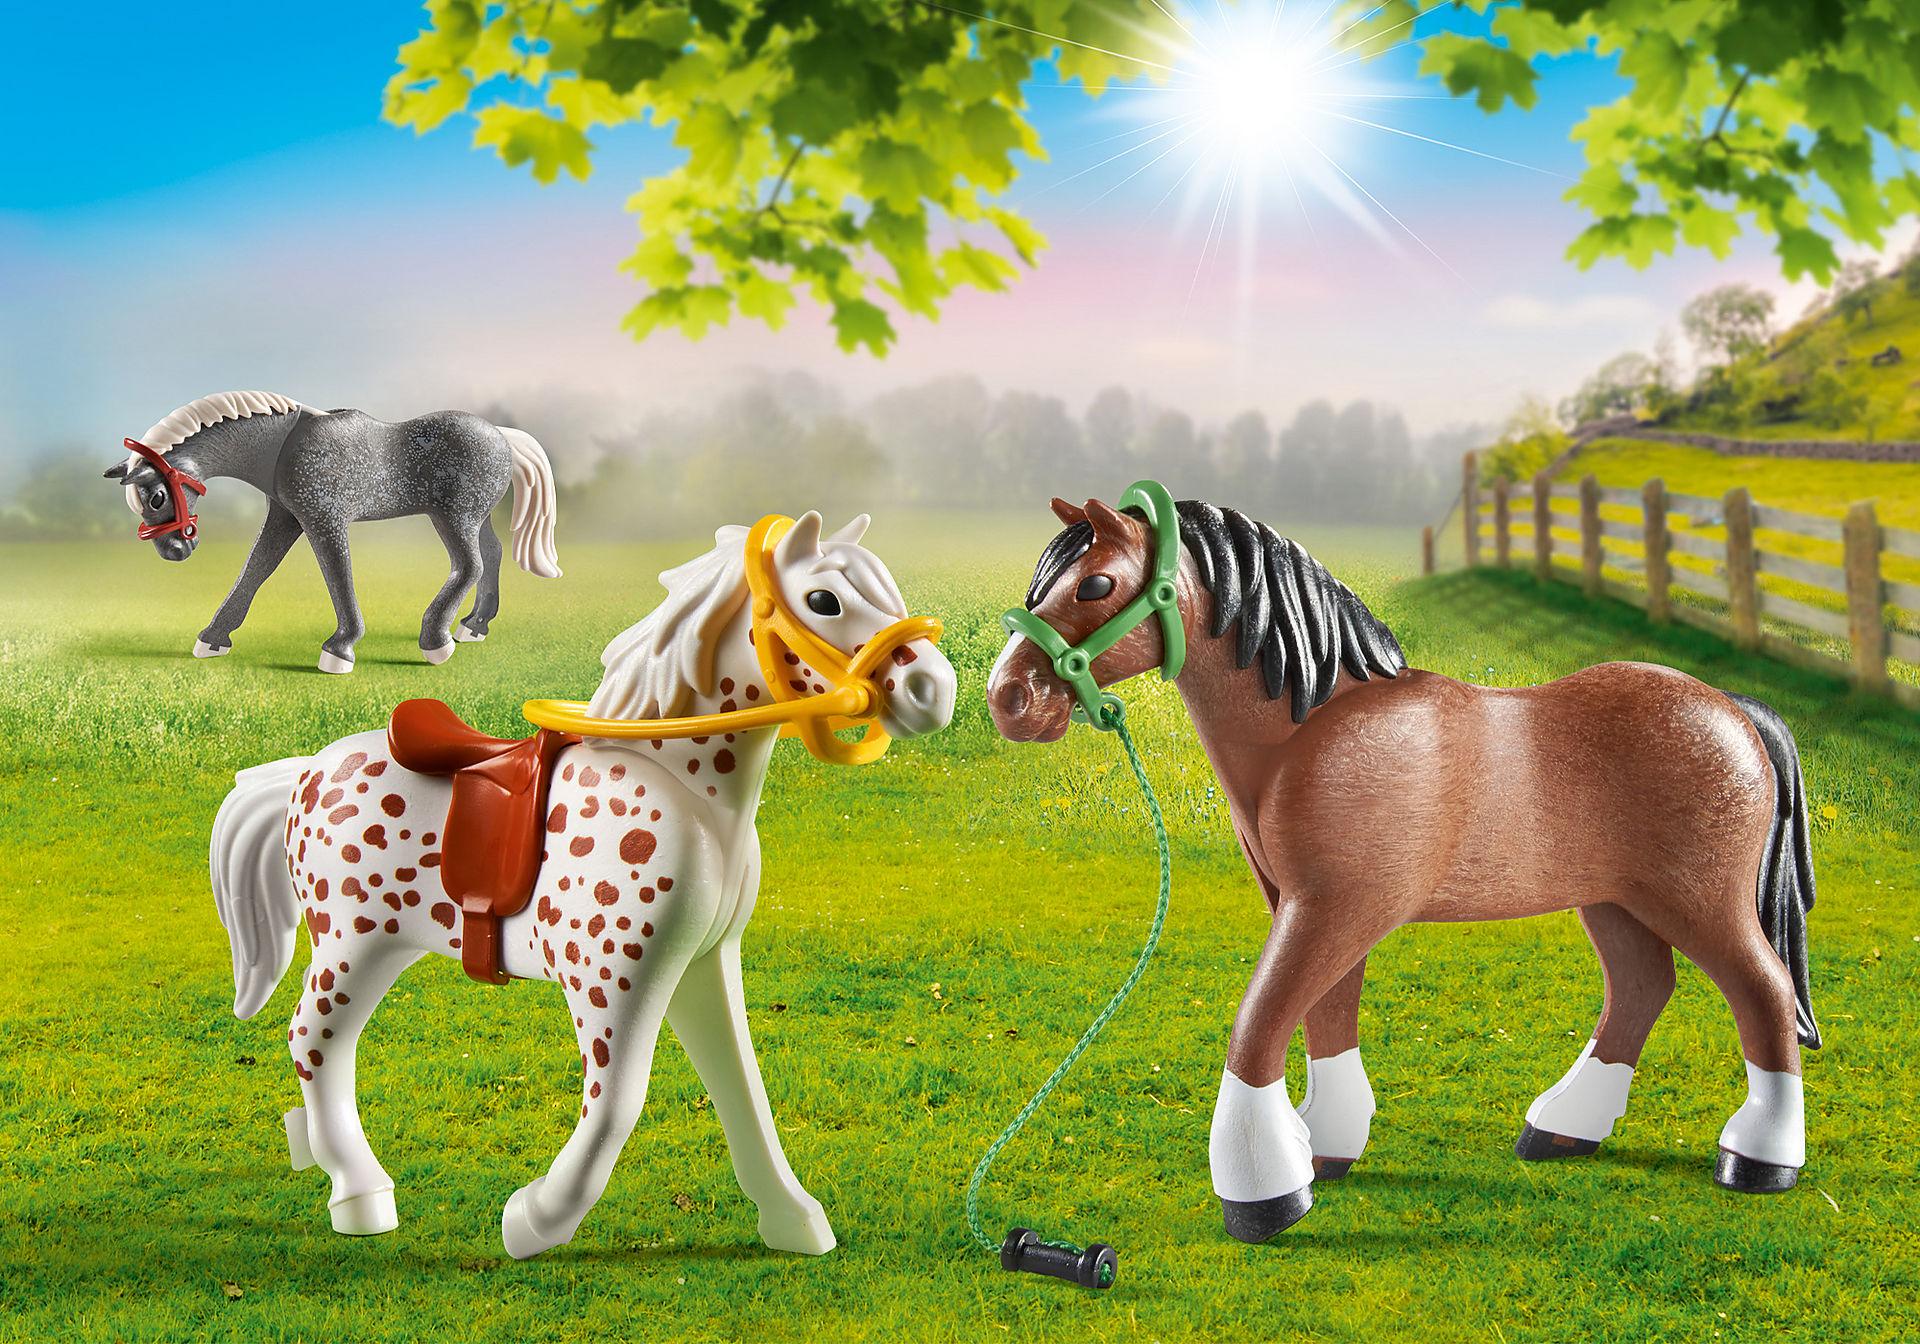 70683 3 horses zoom image1